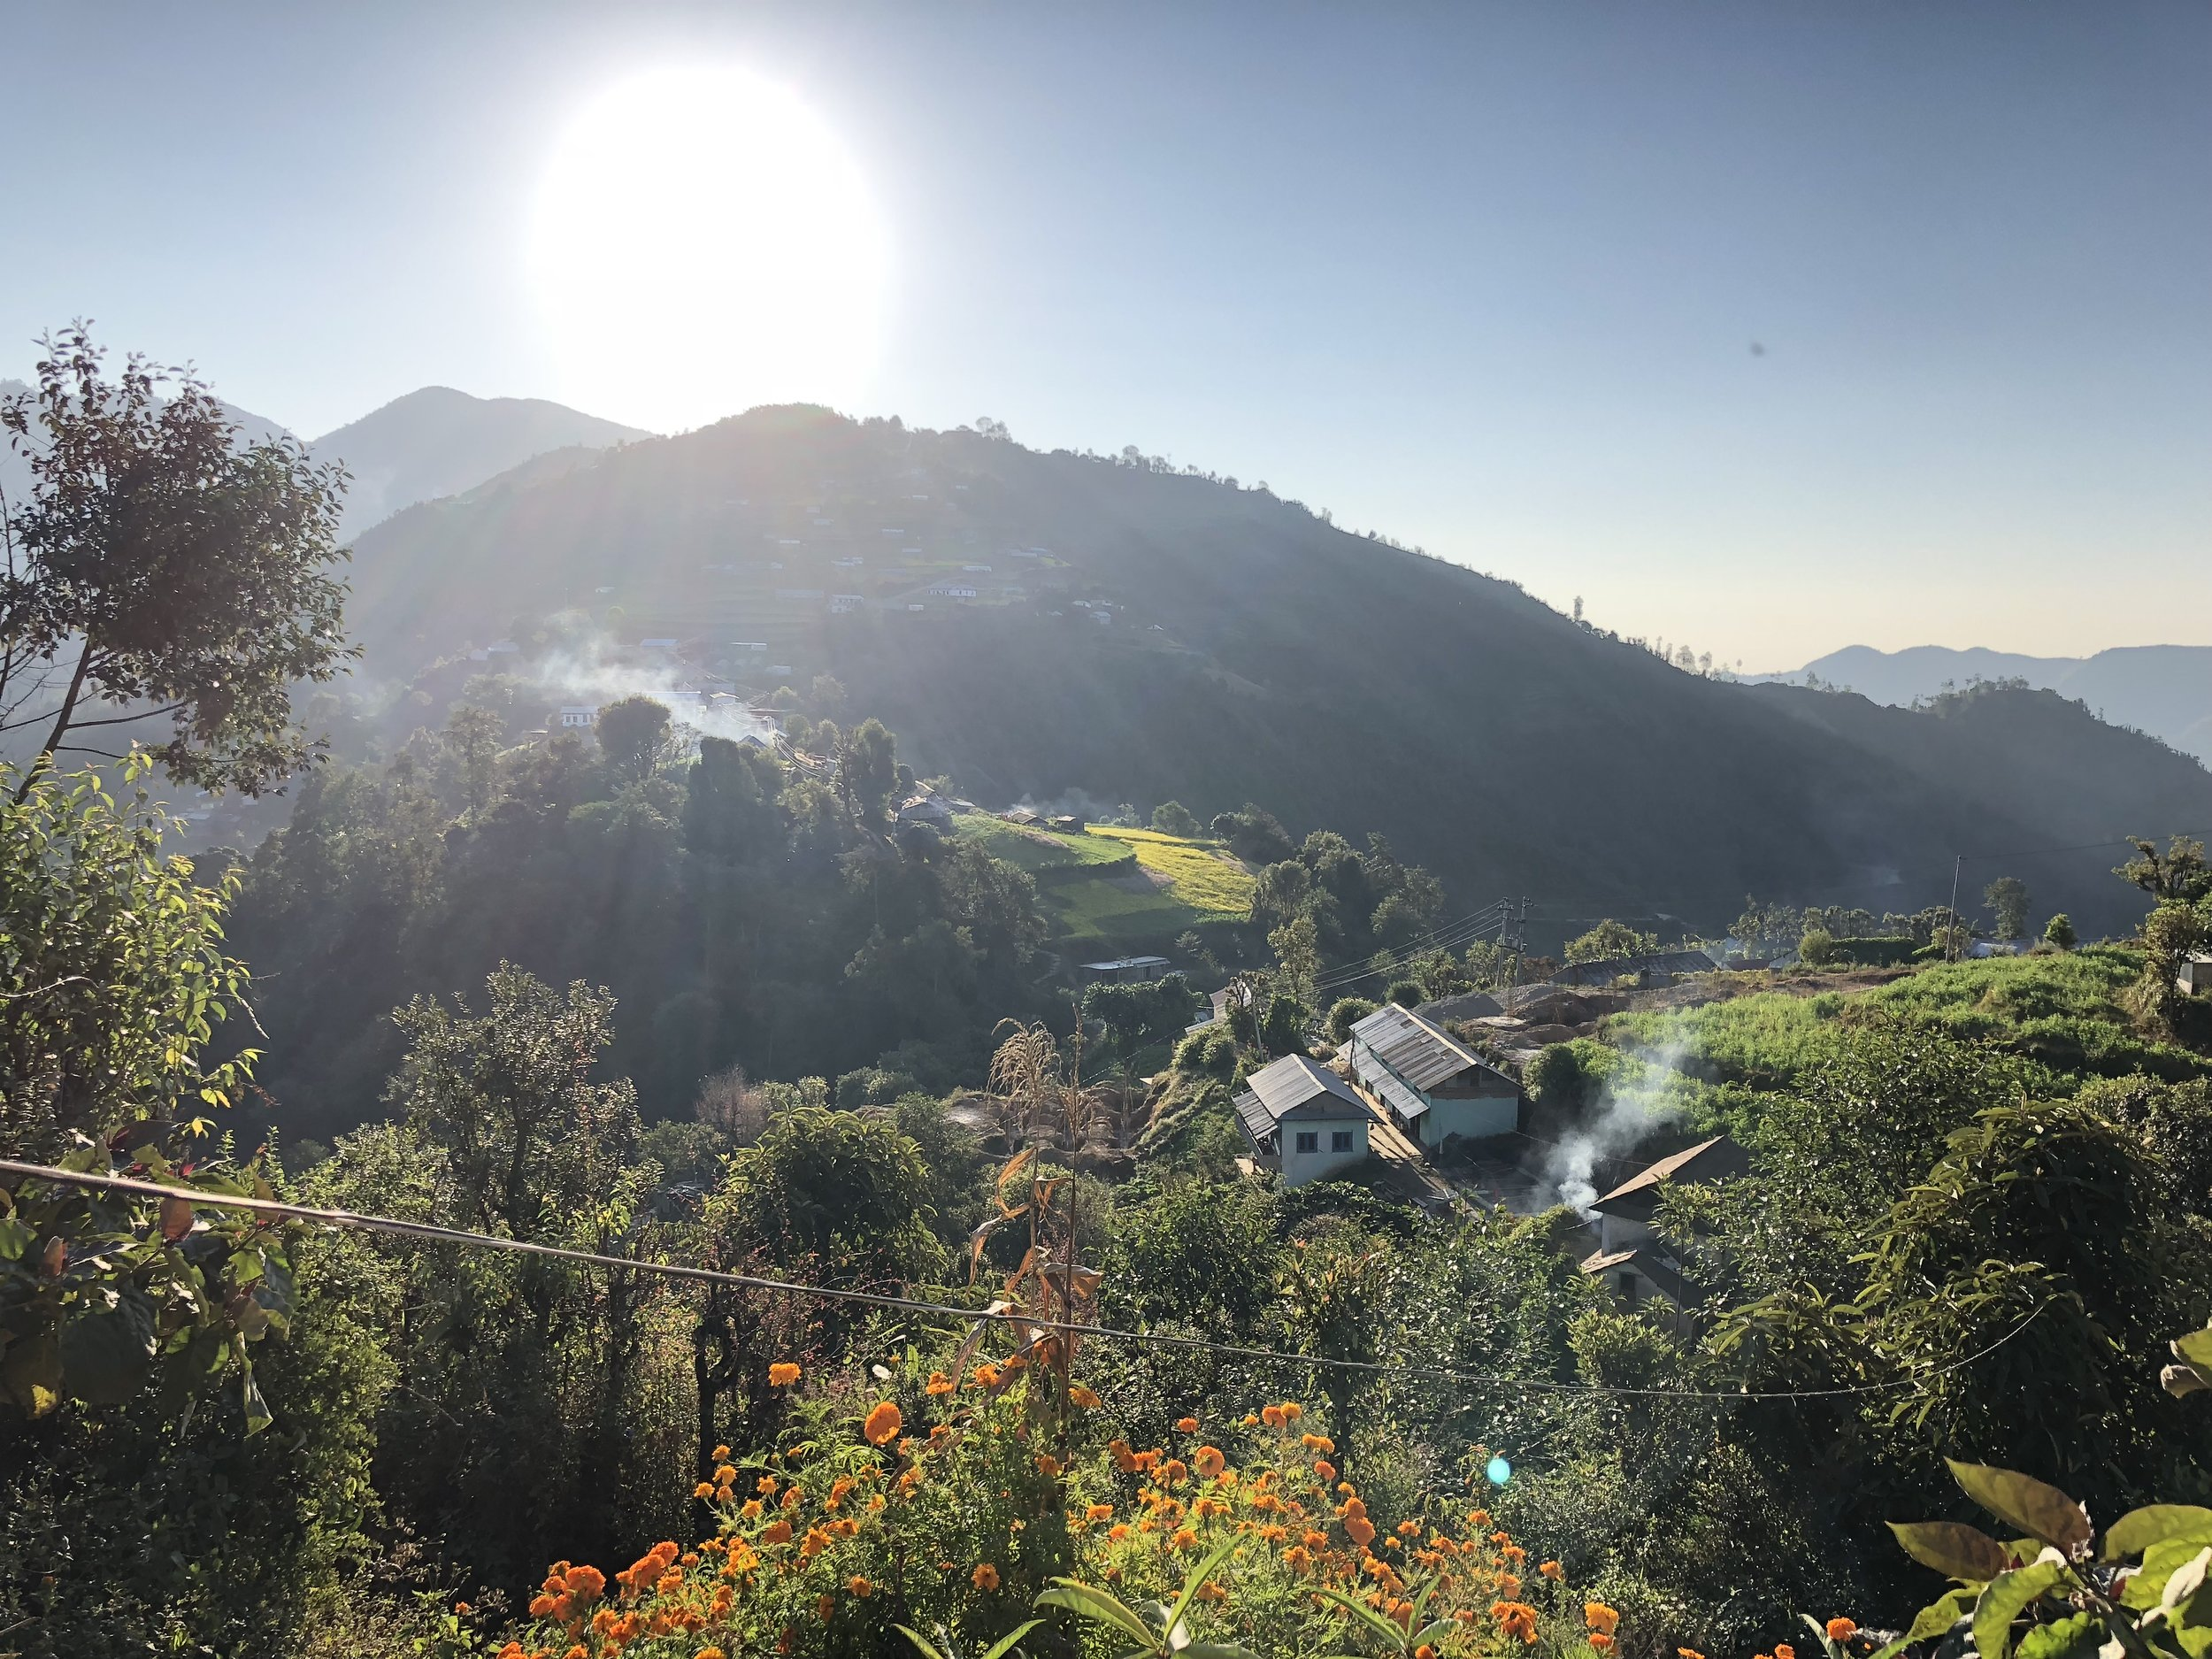 sunrise at manikhelnepal kathmandu valley nepal trekking weather homestay.jpg